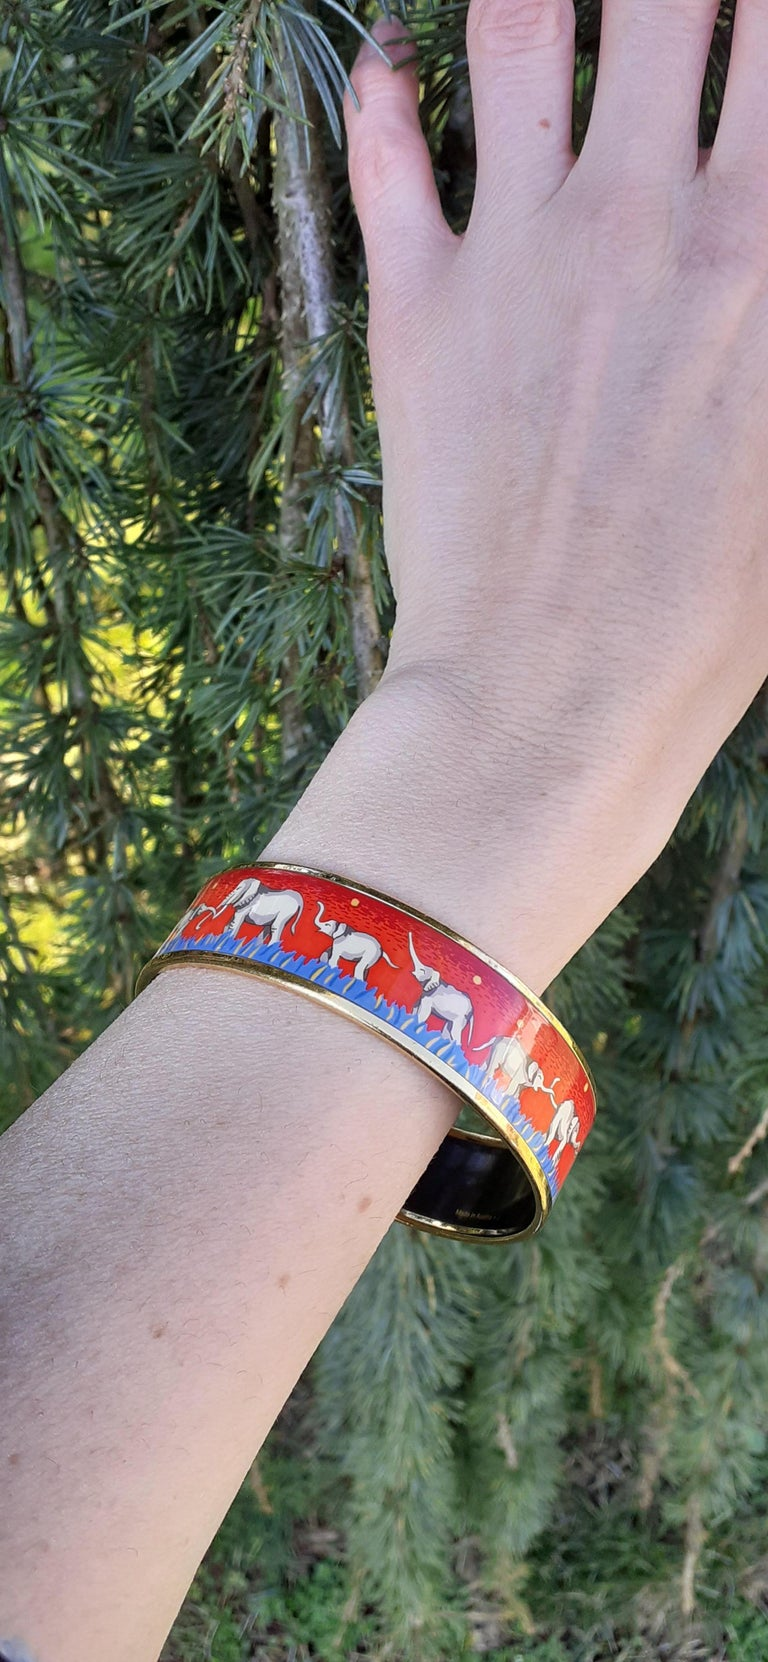 Hermès Enamel Printed Bracelet Elephants Grazing Red Ghw Large Size GM 70 For Sale 6